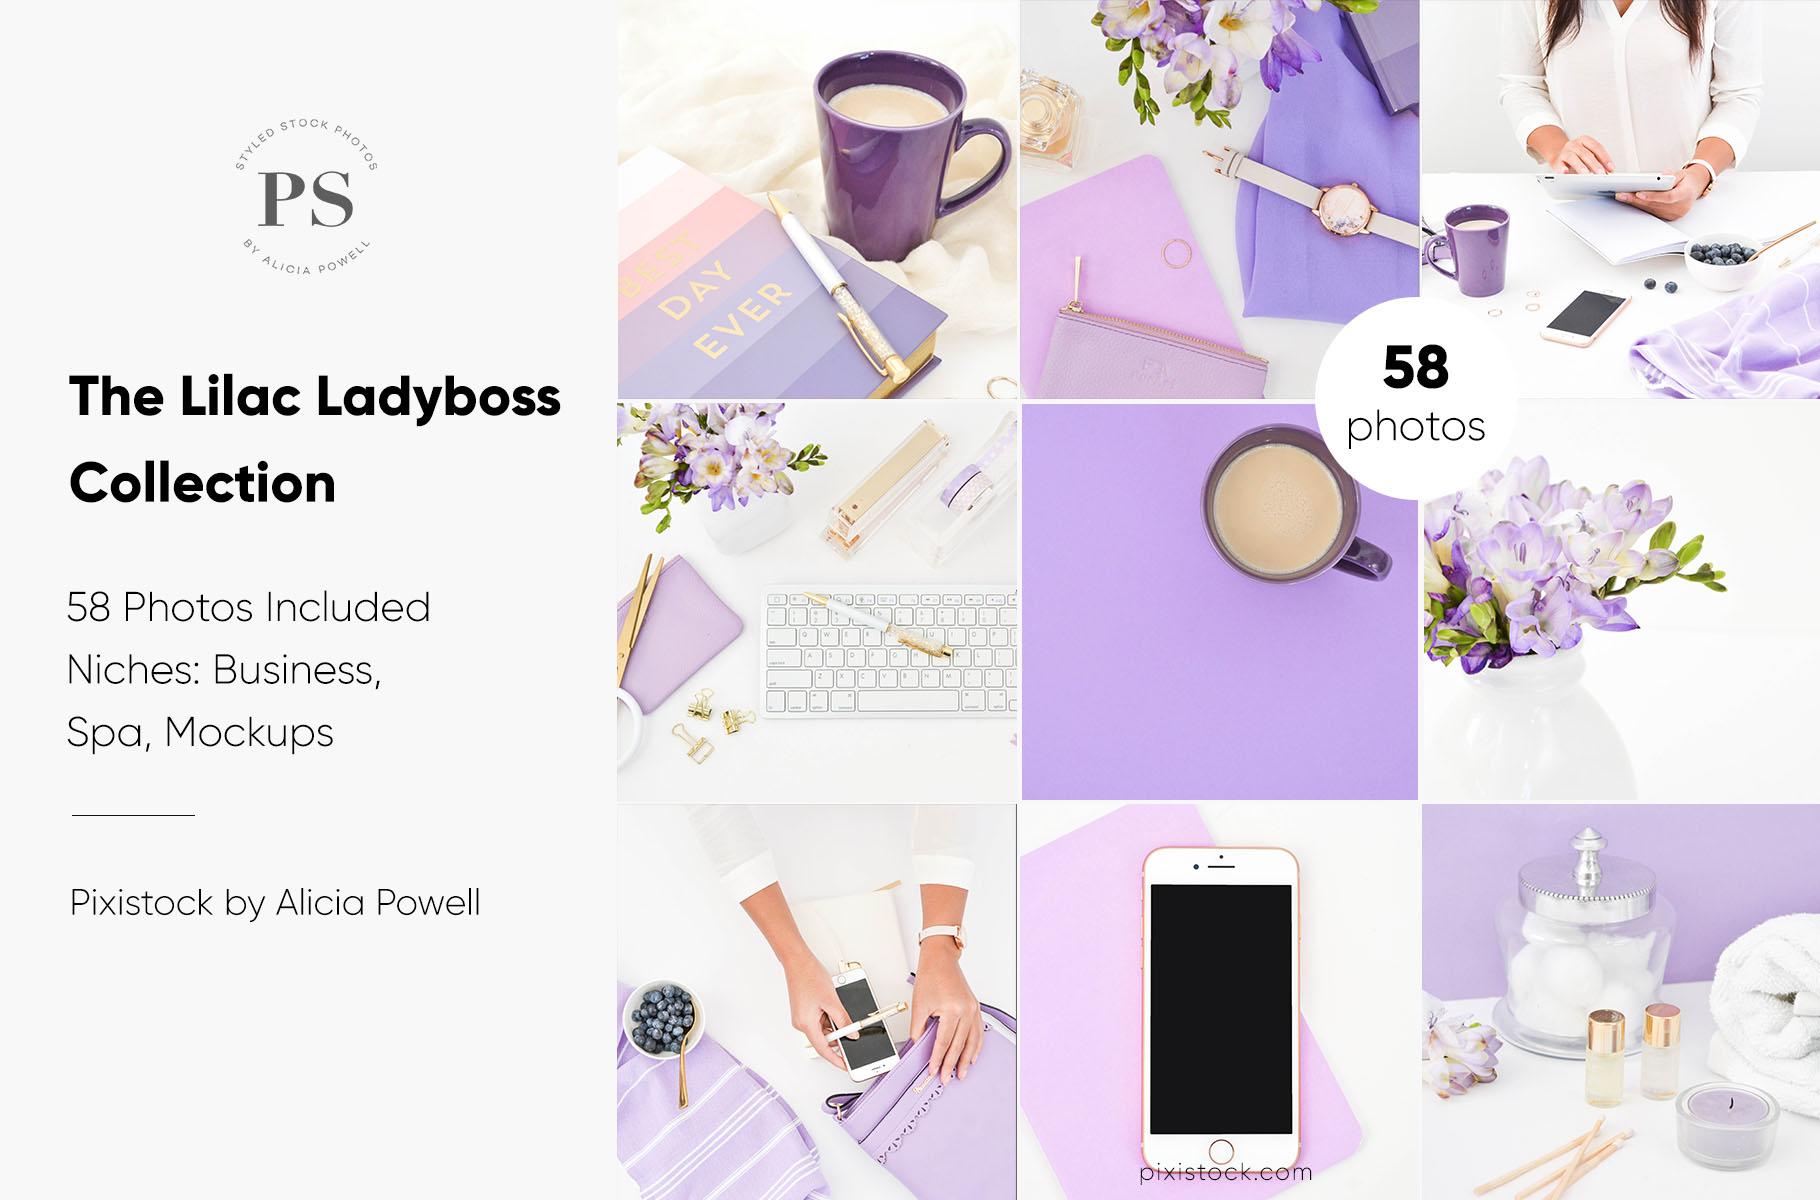 Lilac Ladyboss Stock Photo Collection